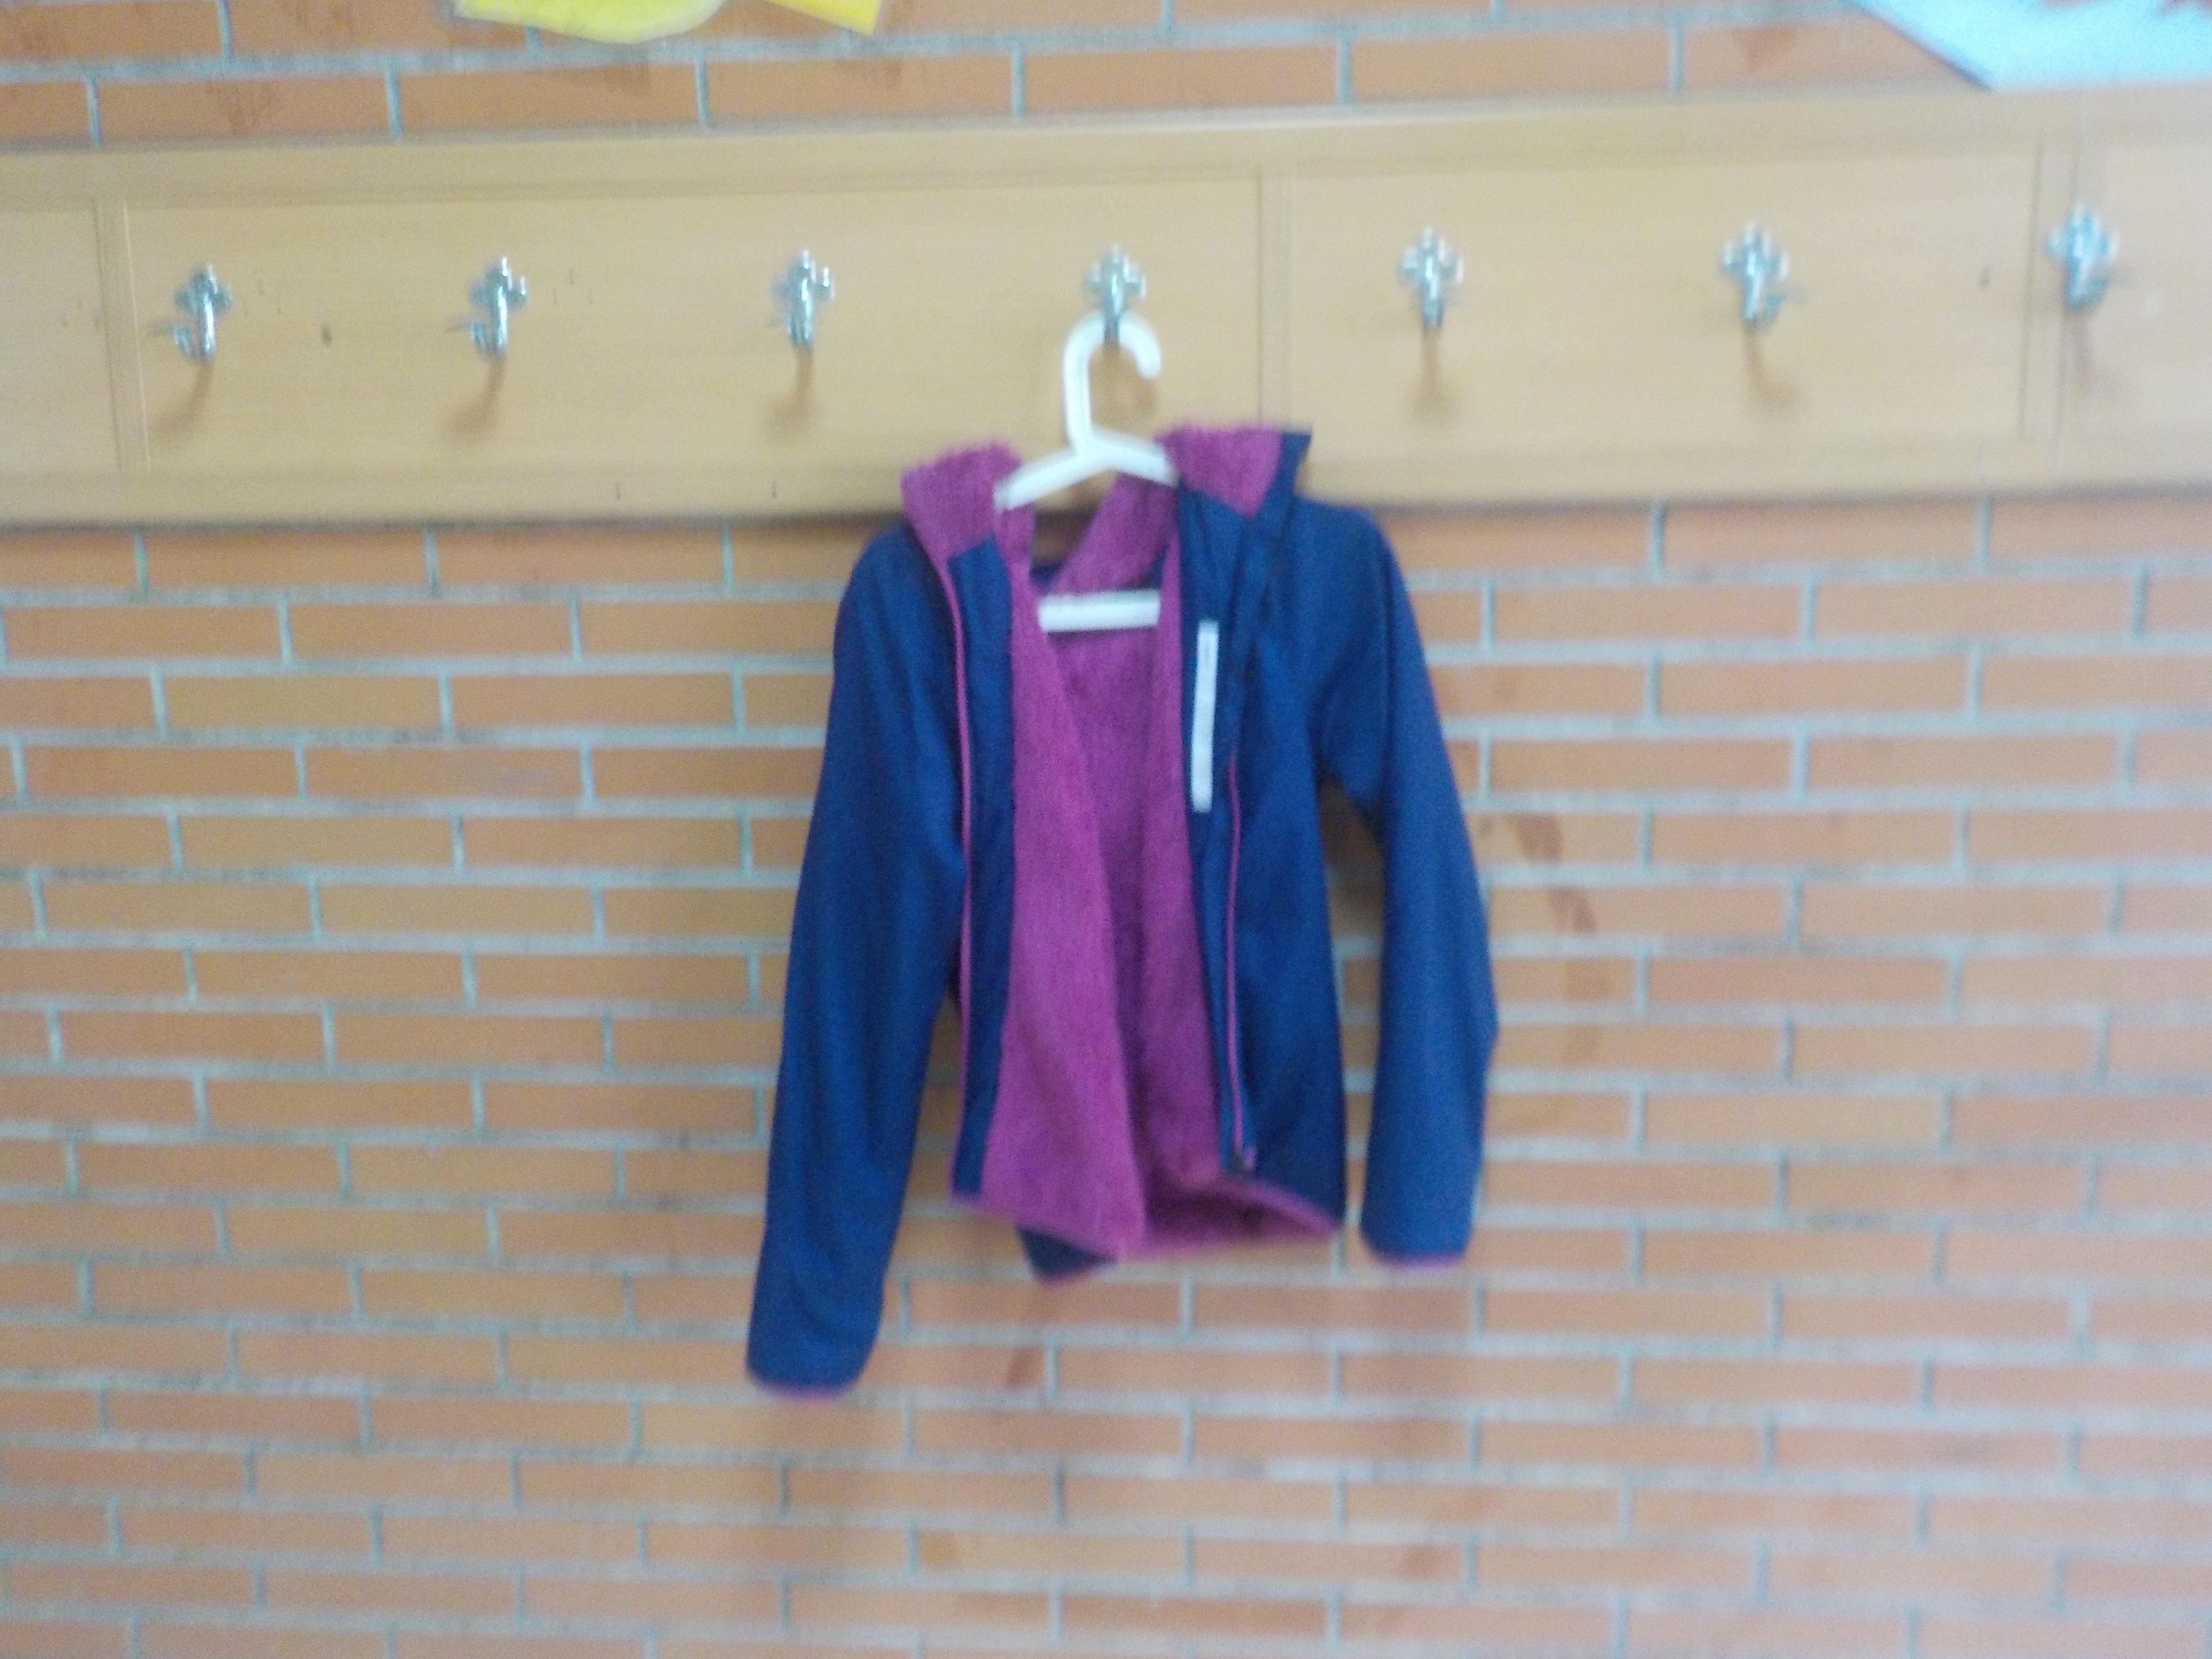 Catalogo de ropa olvidada 2  2018 6